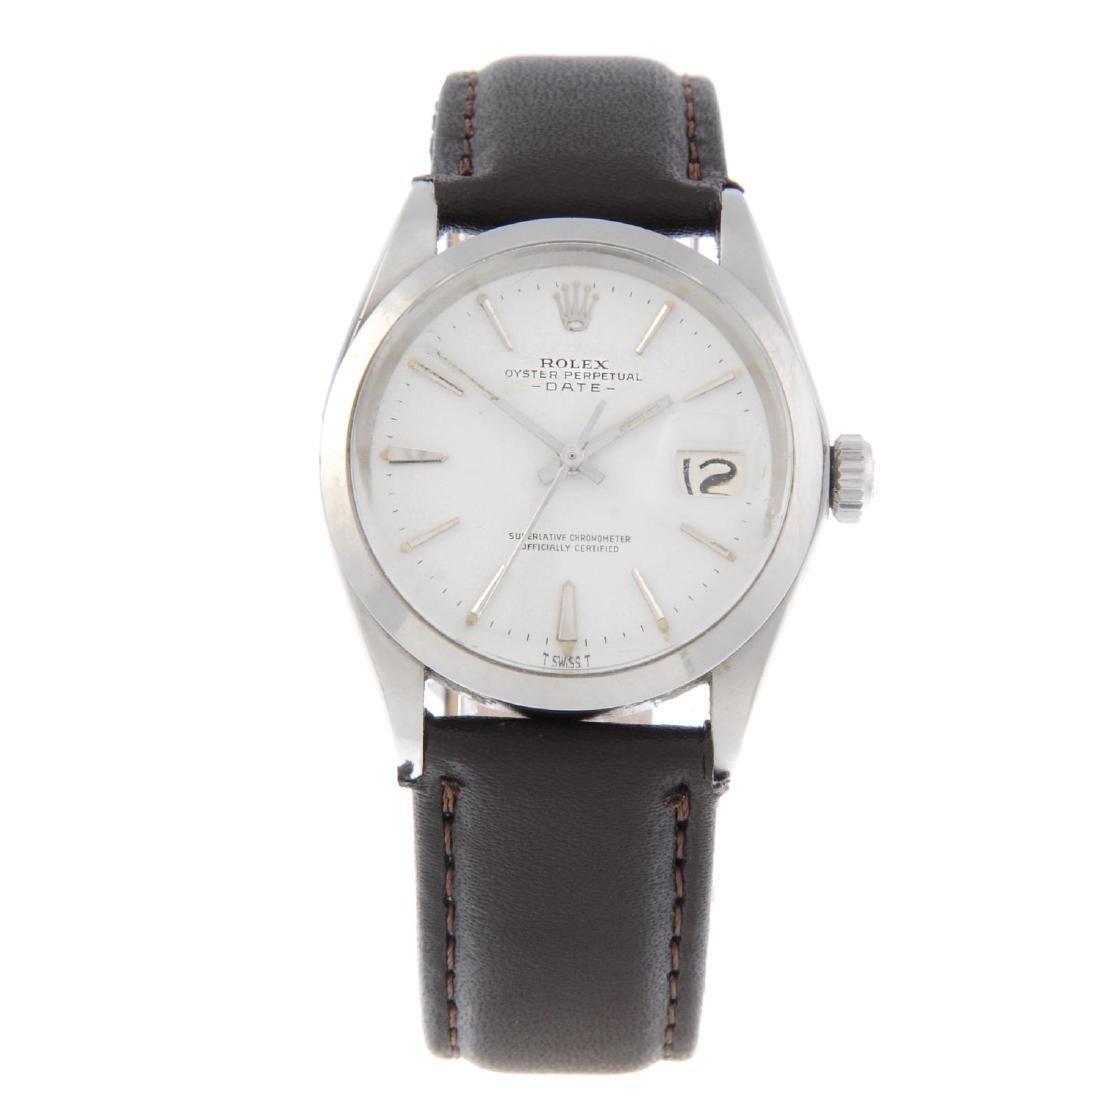 ROLEX - a gentleman's Oyster Perpetual Date wrist